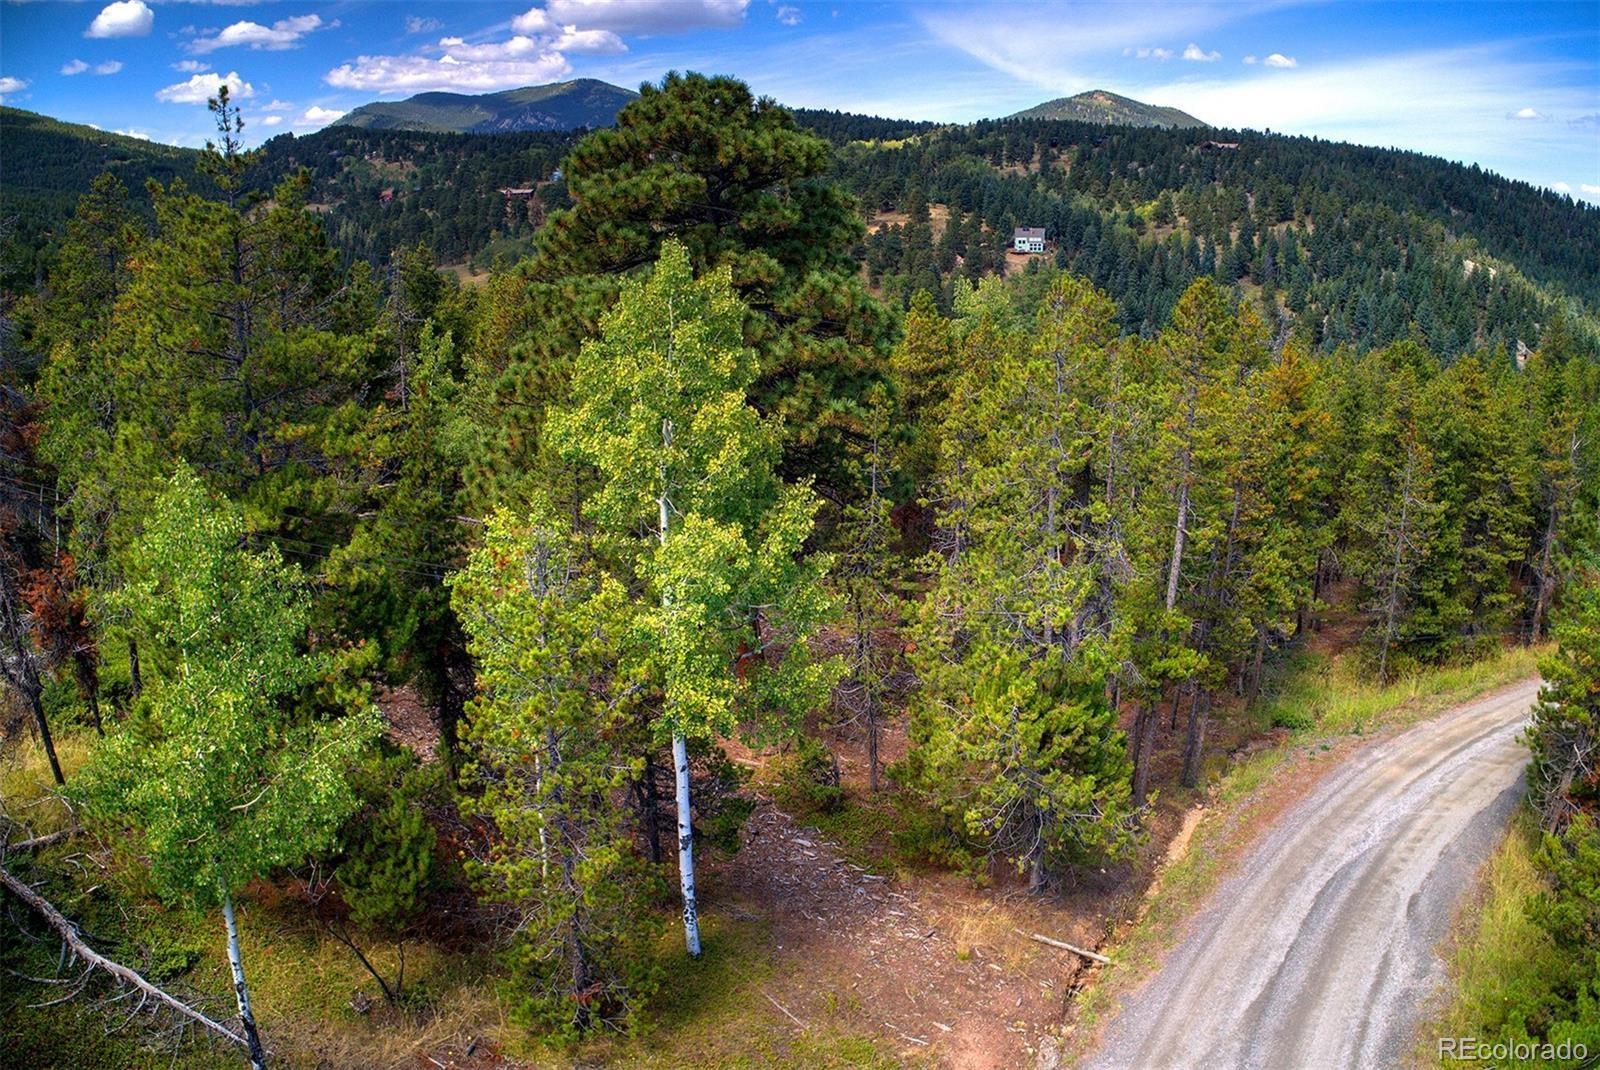 MLS# 2193114 - 3 - 1 Mountain Estate Drive, Evergreen, CO 80439